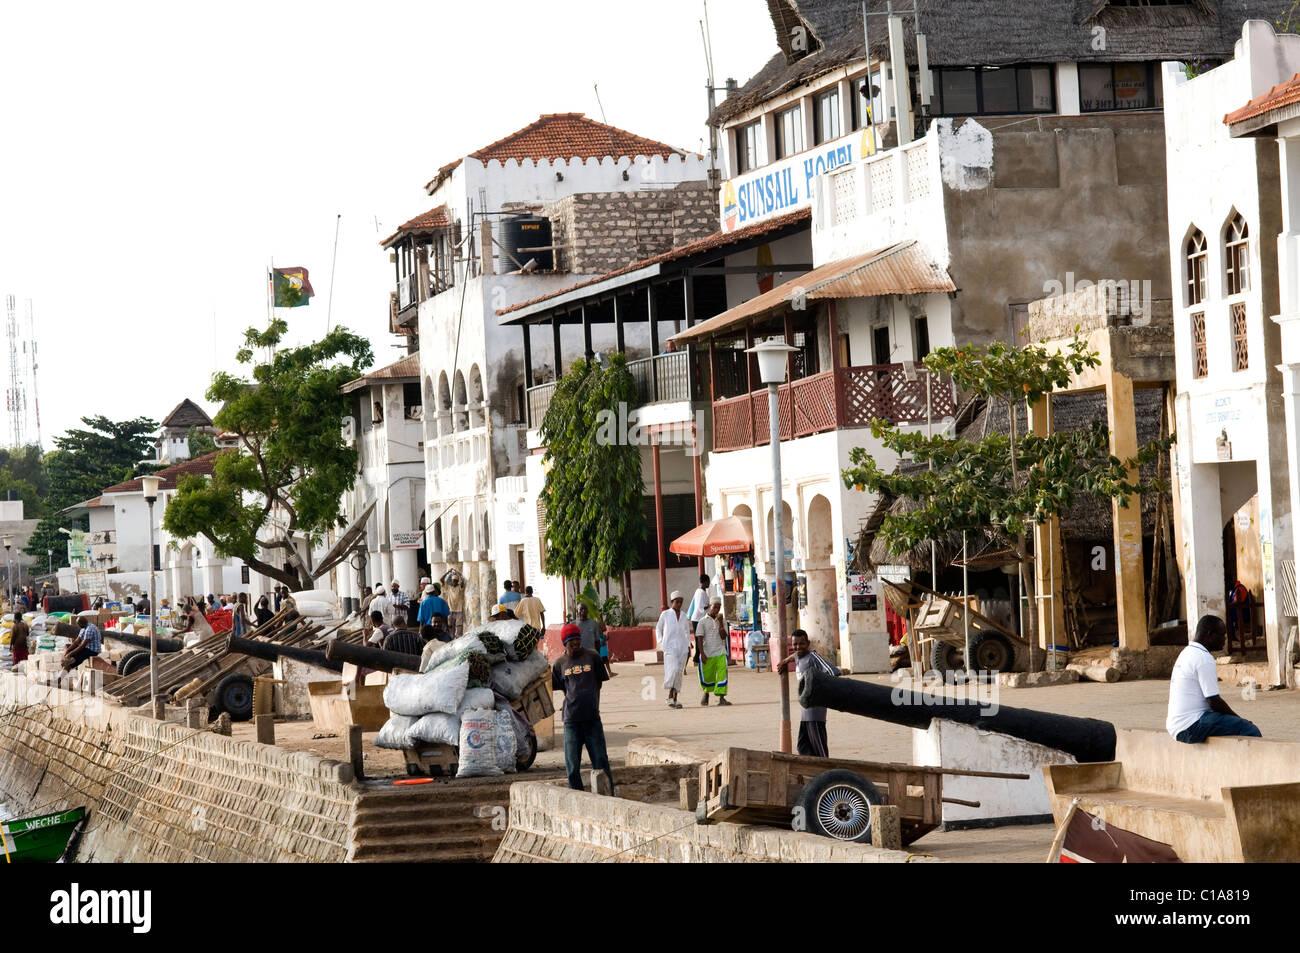 Foreshore scene, Old Stone Town, Lamu, Kenya Stock Photo